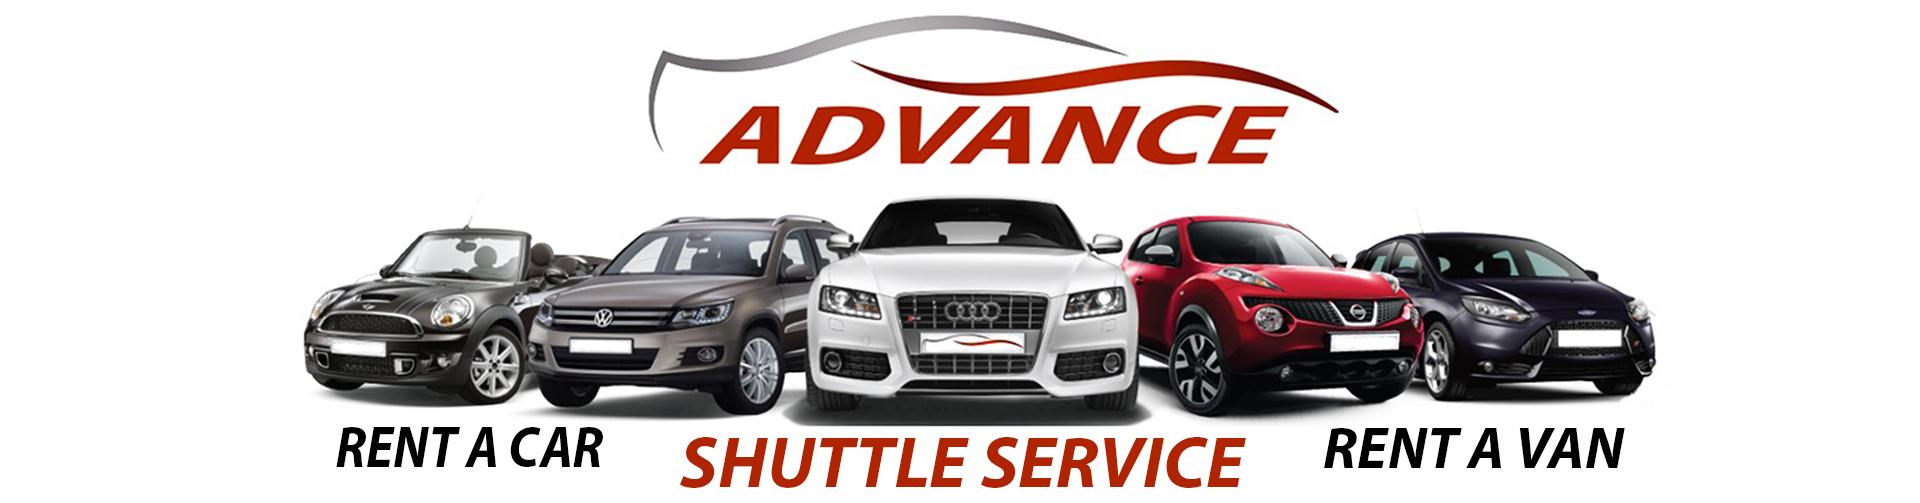 Advance | Rent A Car